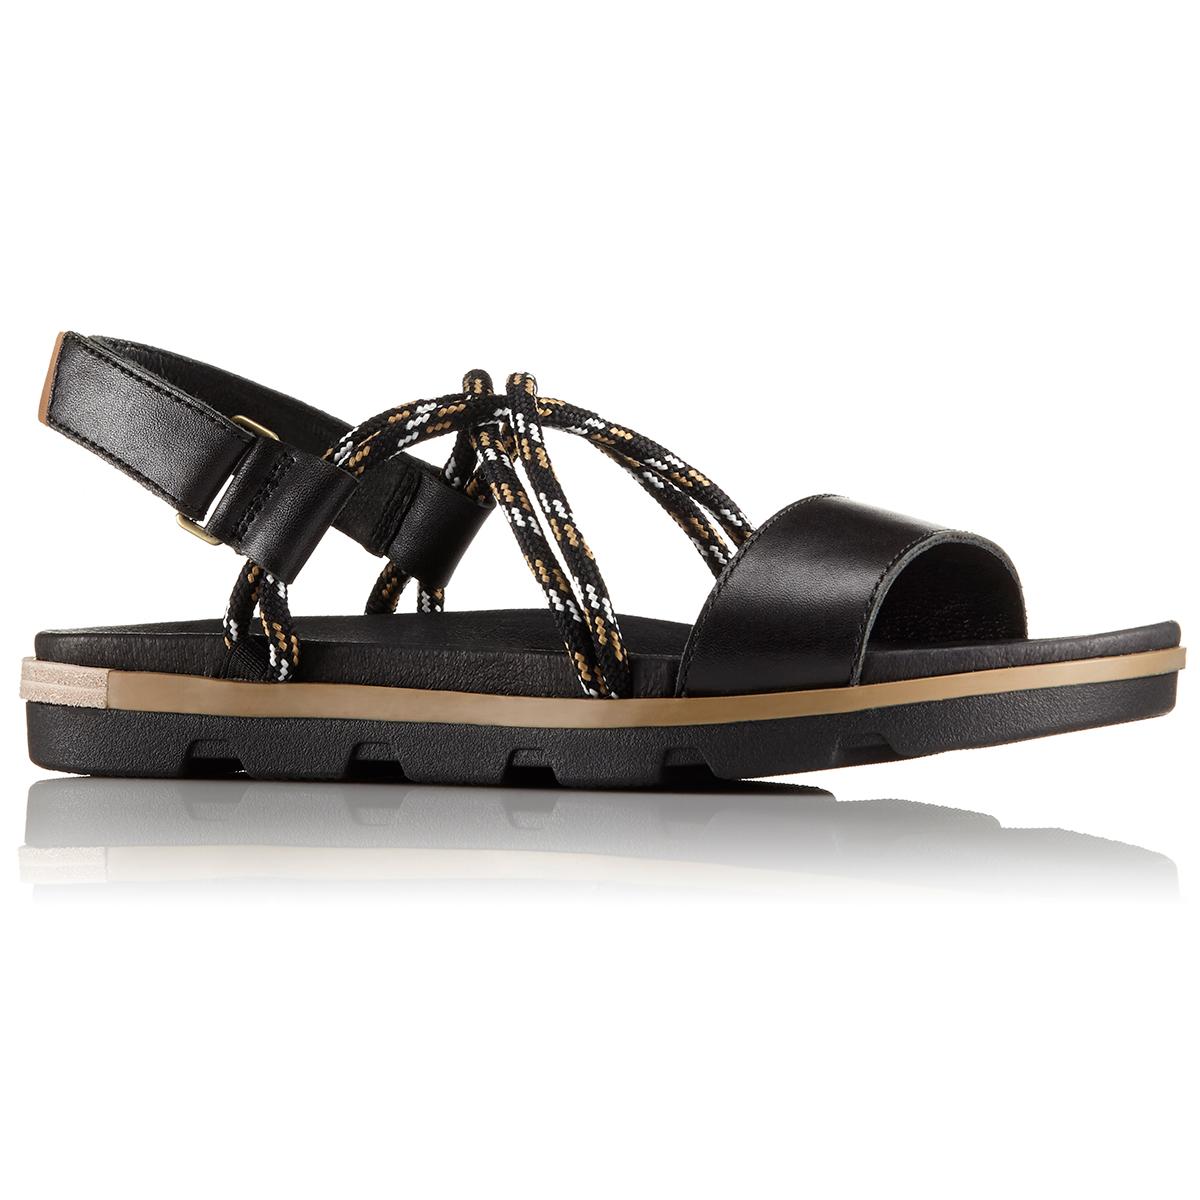 Sorel Women's Torpeda Ii Sandals - Black, 6.5